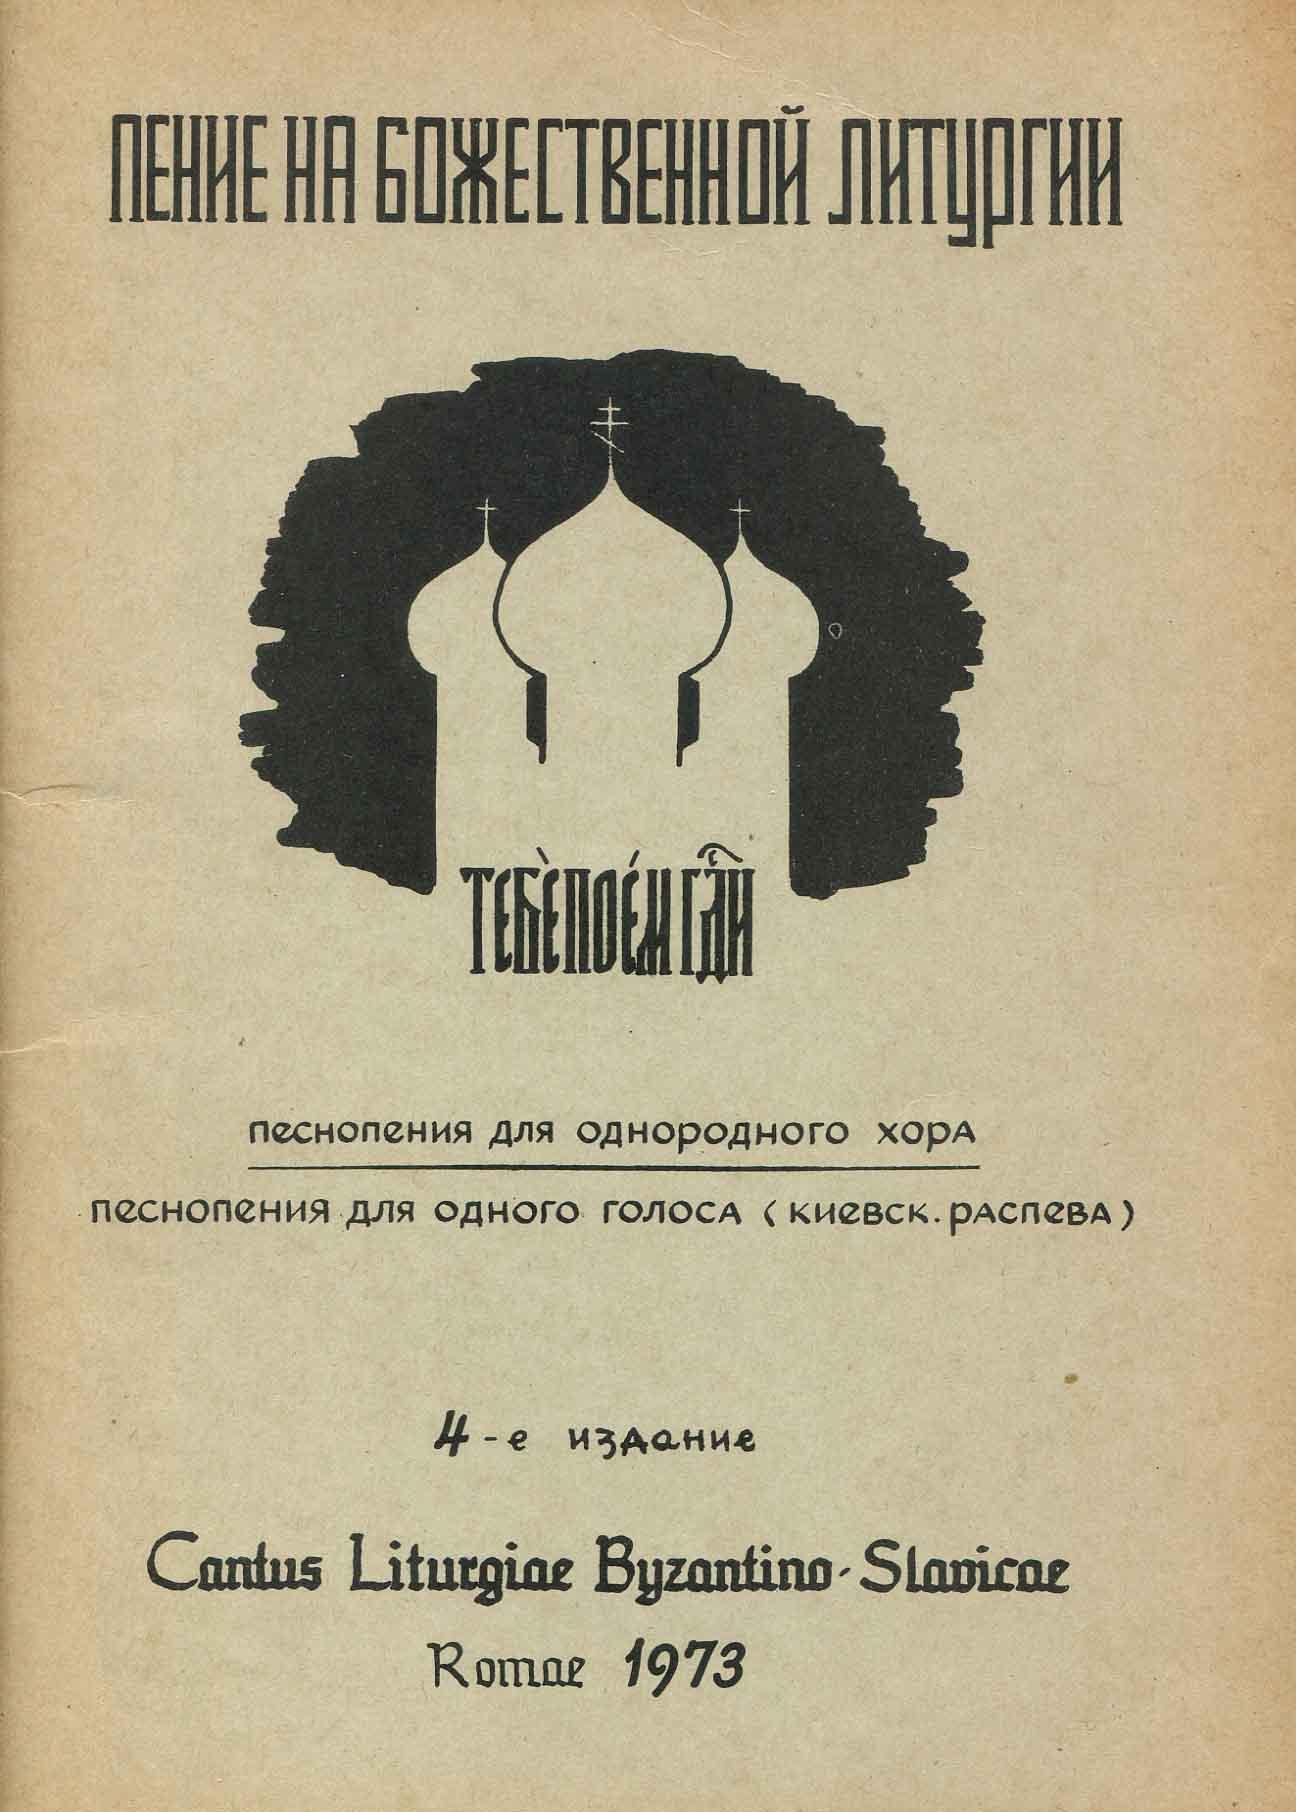 Canto liturgico bizantino-slavo